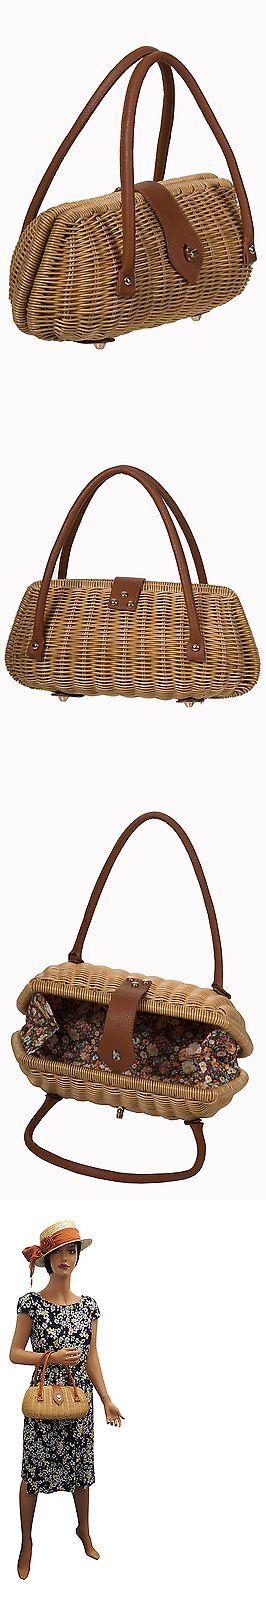 Bags Handbags and Cases 74962: Retro Ladies 1940 S 1950 S Style Brown Rattan Wicker Handbag Box Bag -> BUY IT NOW ONLY: $29.95 on eBay!